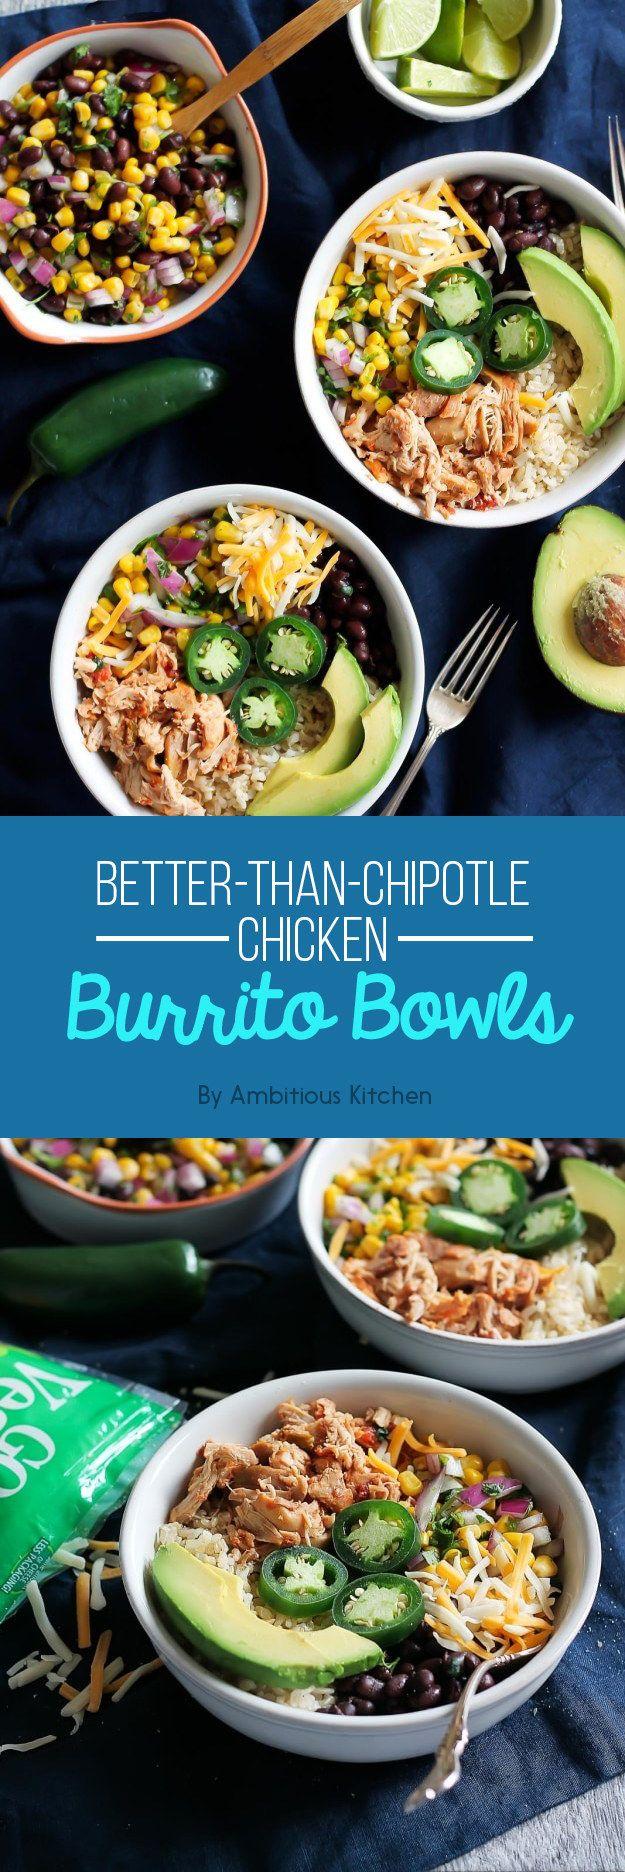 Better-Than-Chipotle Chicken Burrito Bowls